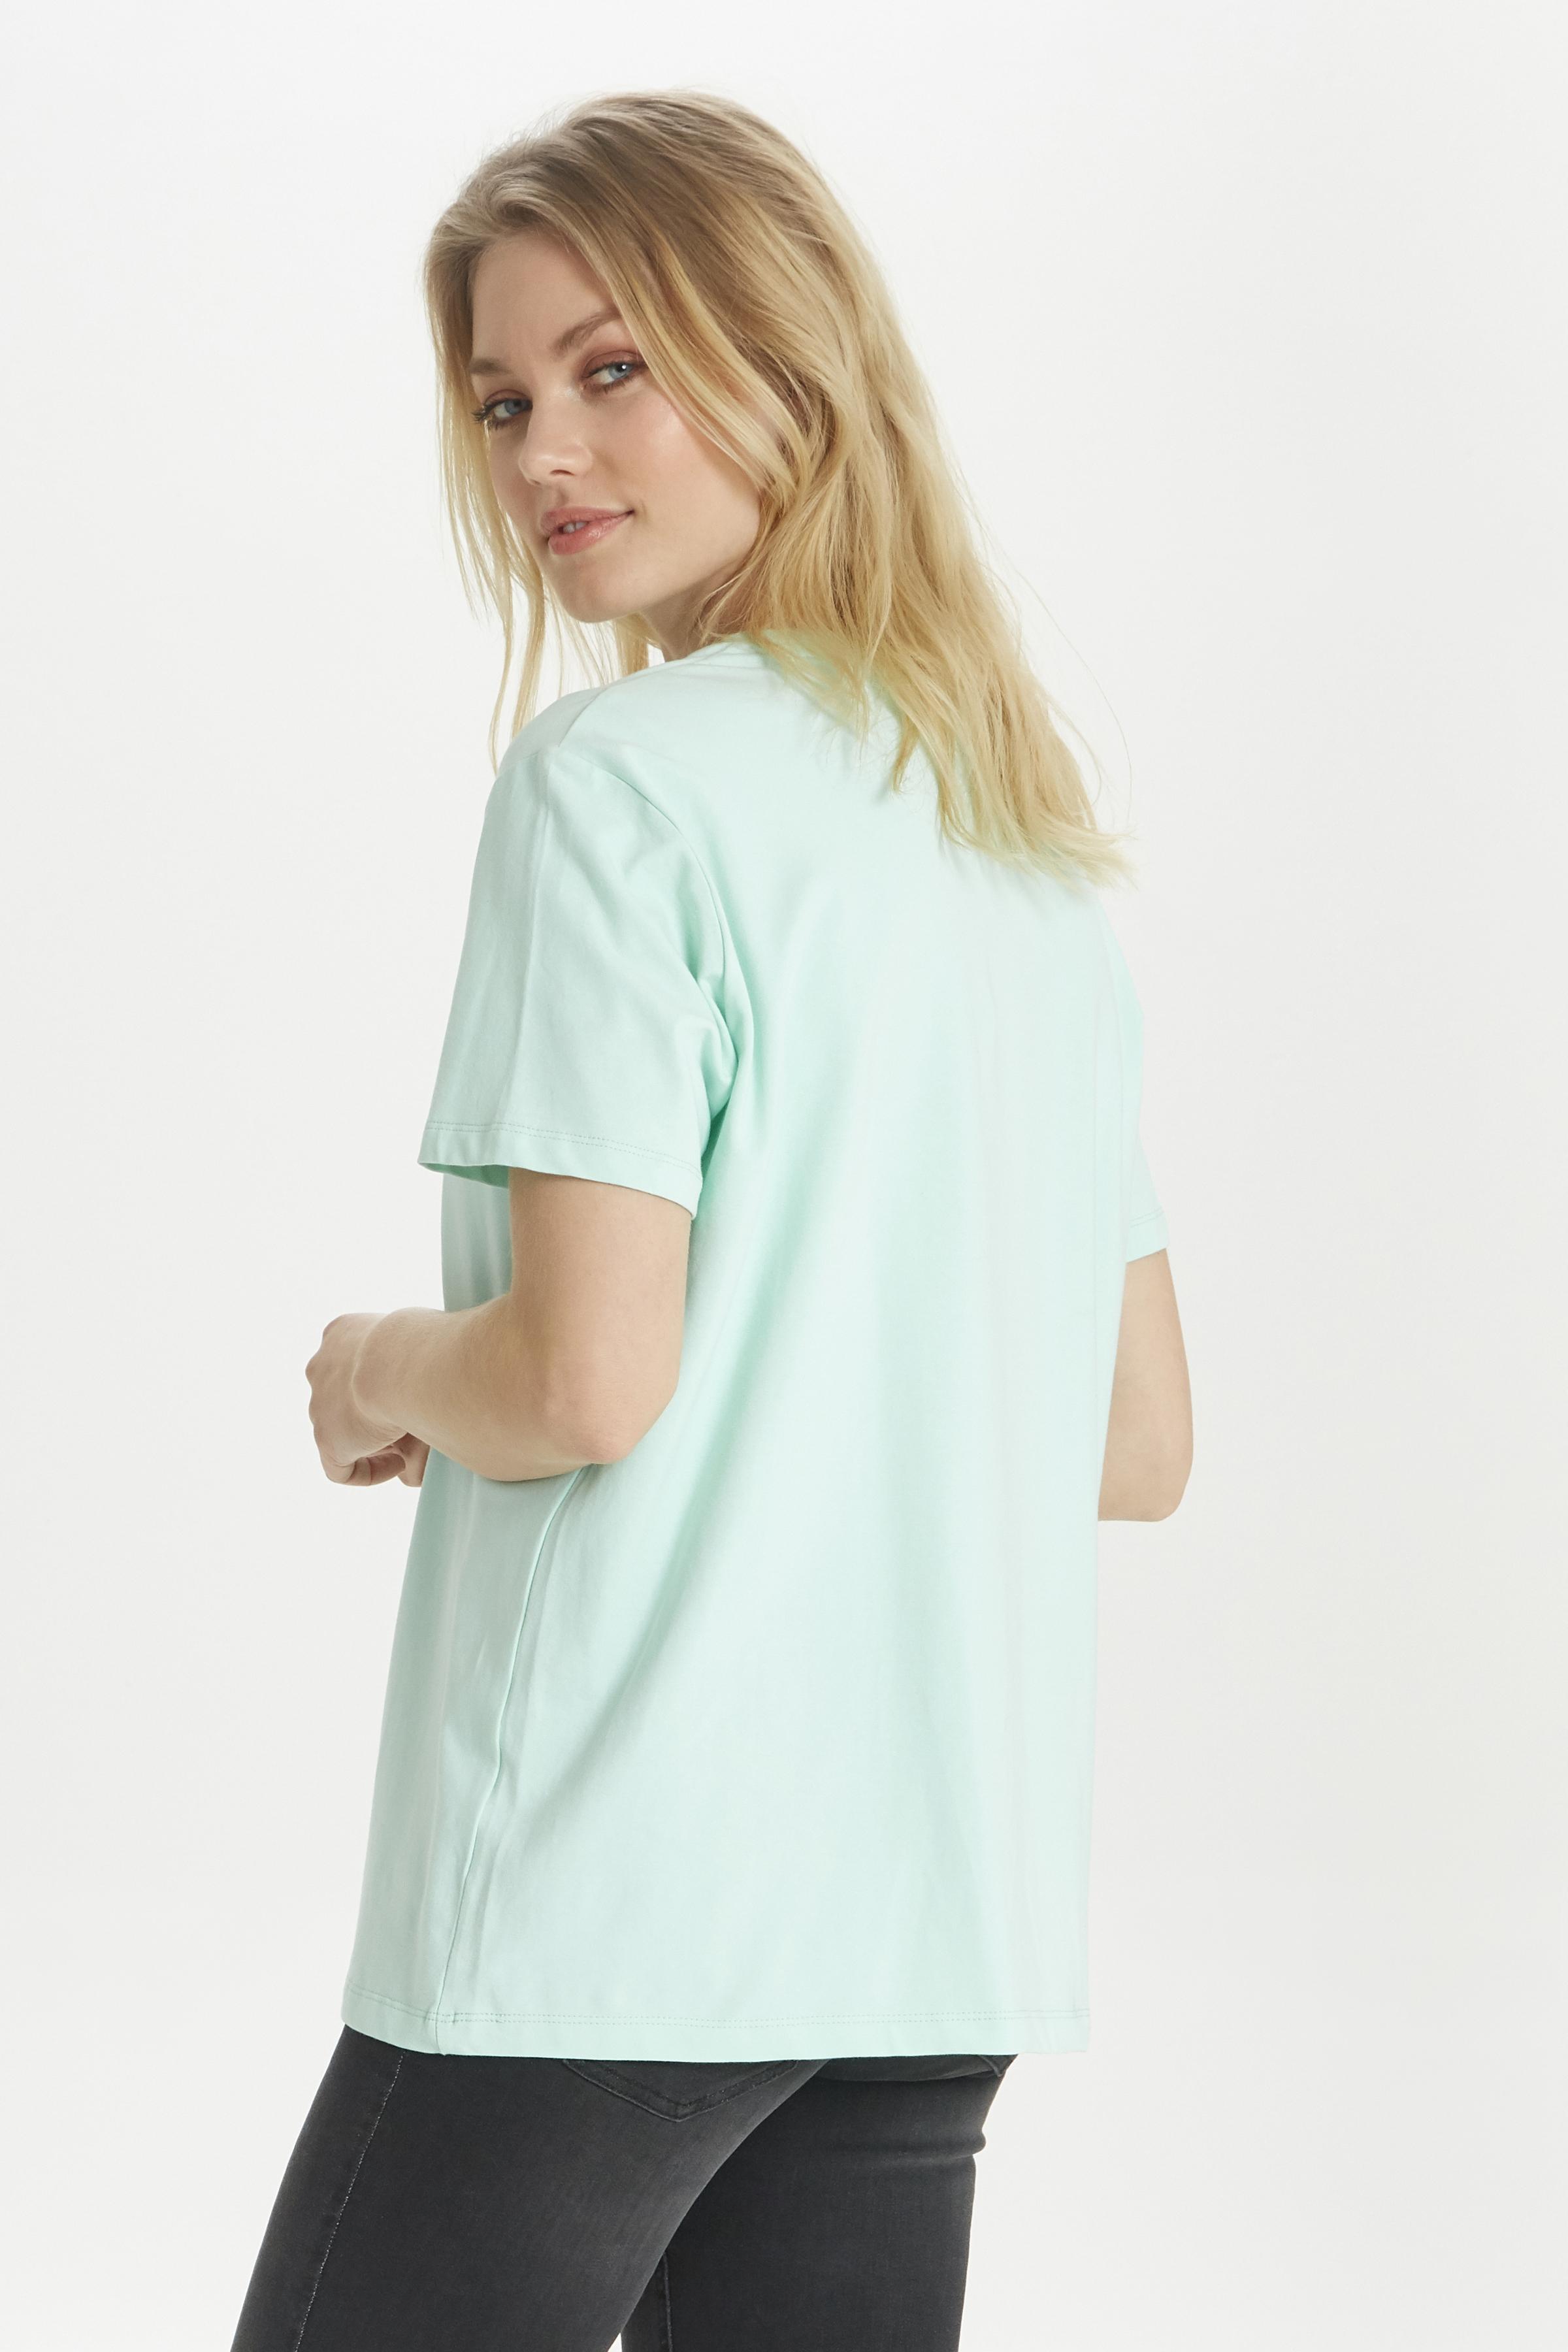 Pastel Mint T-shirt fra b.young – Køb Pastel Mint T-shirt fra str. XS-XXL her